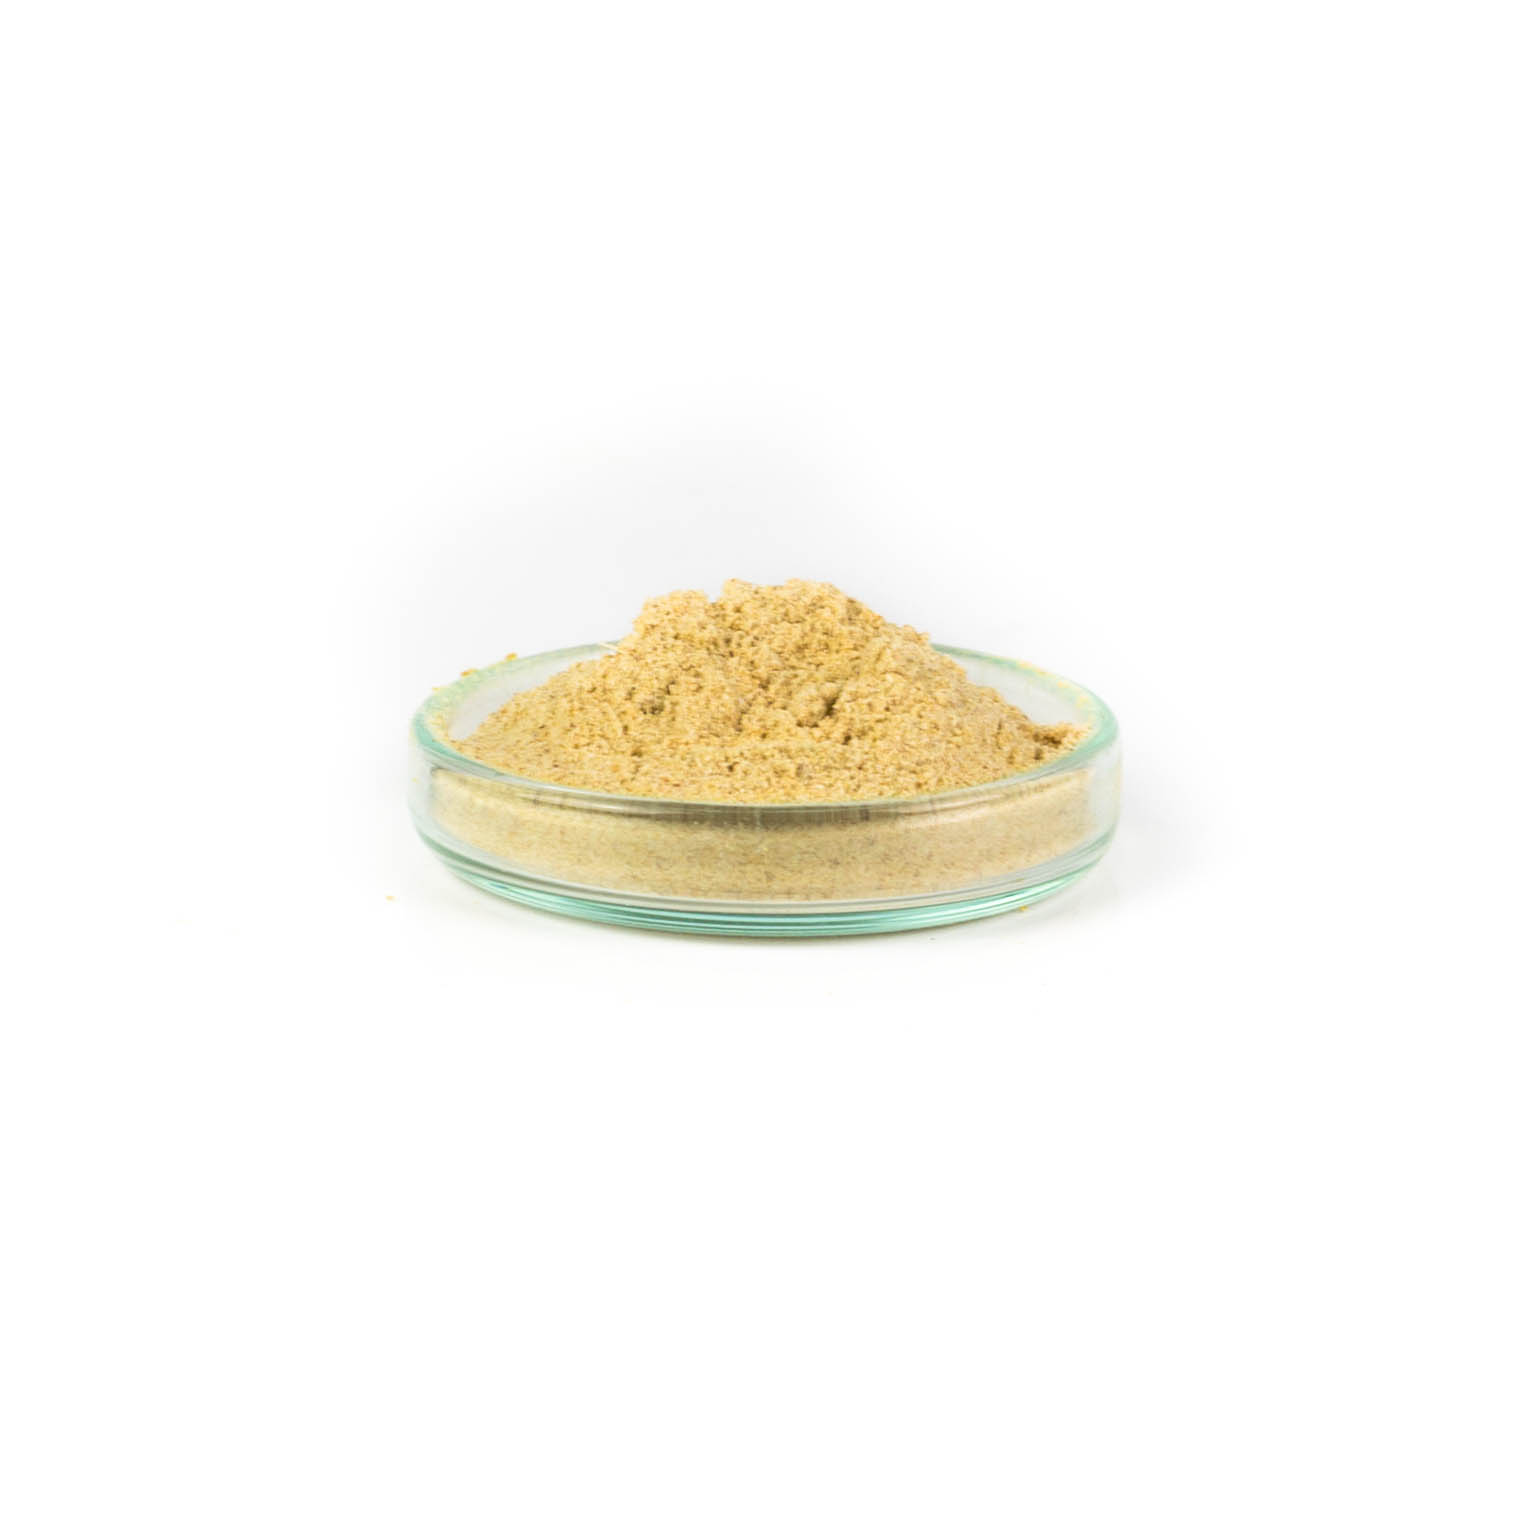 Extrakty 50g - Česnekový extrakt